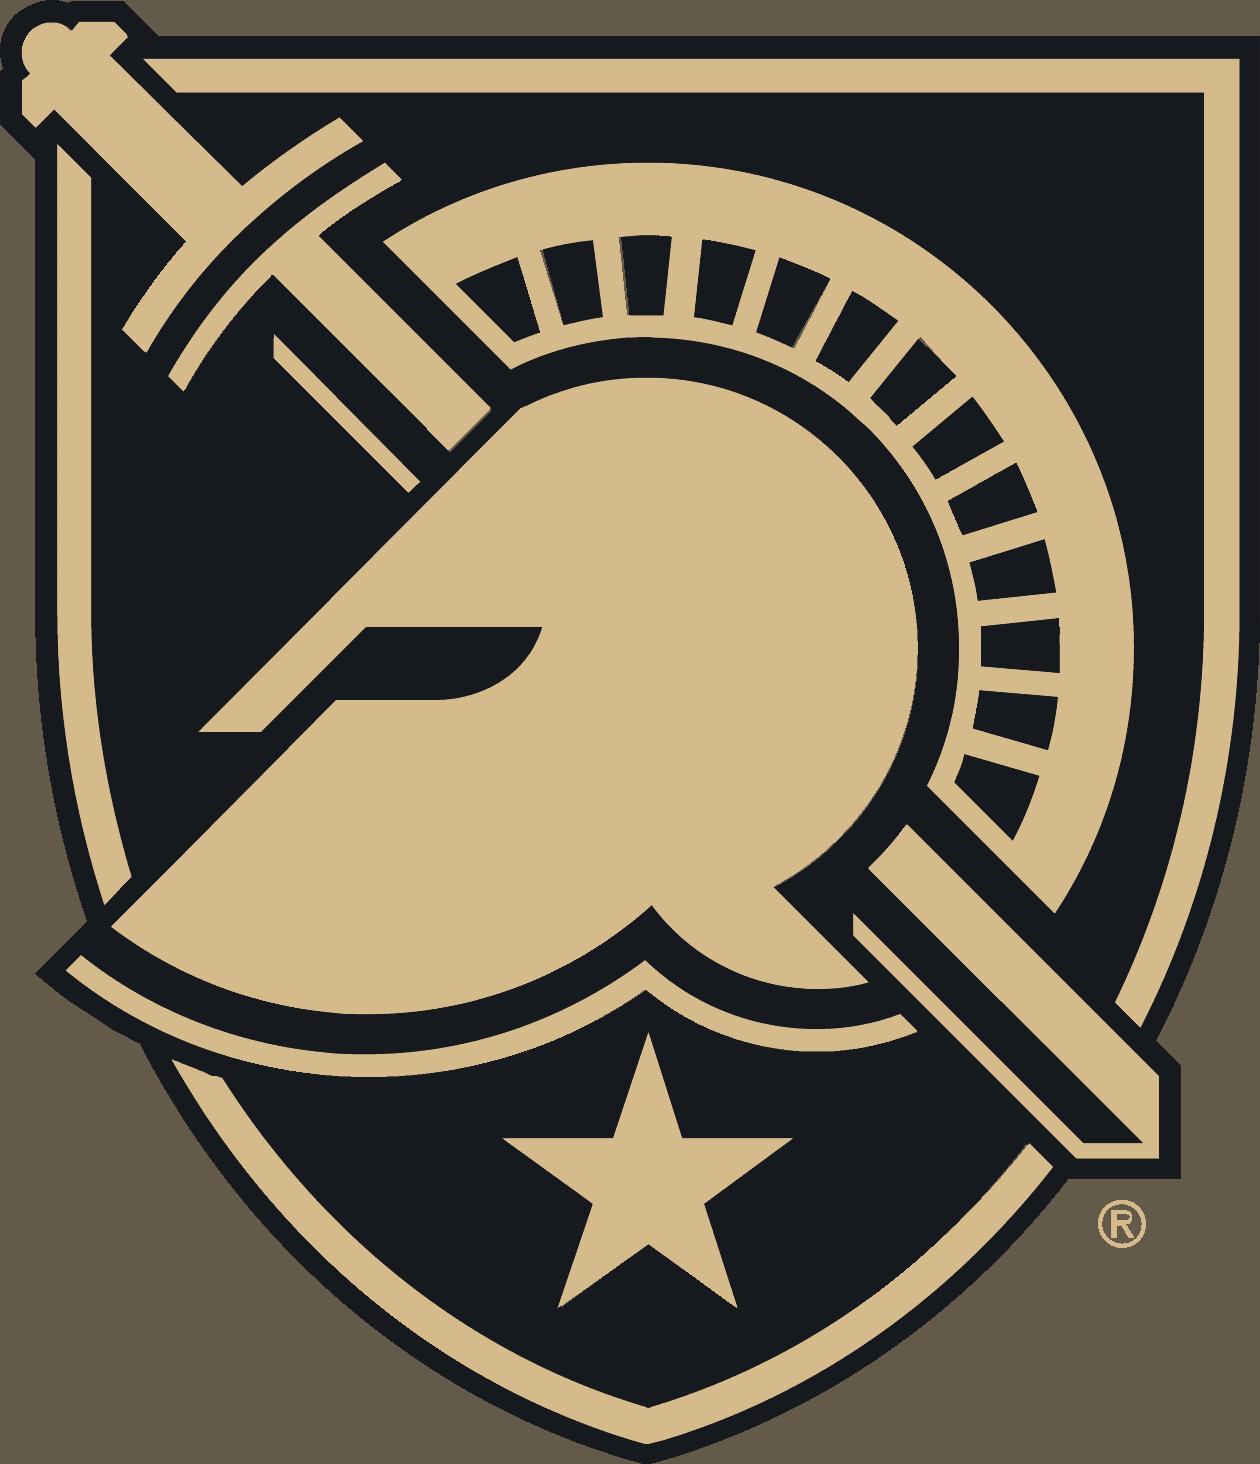 Army Black Knights Logo png